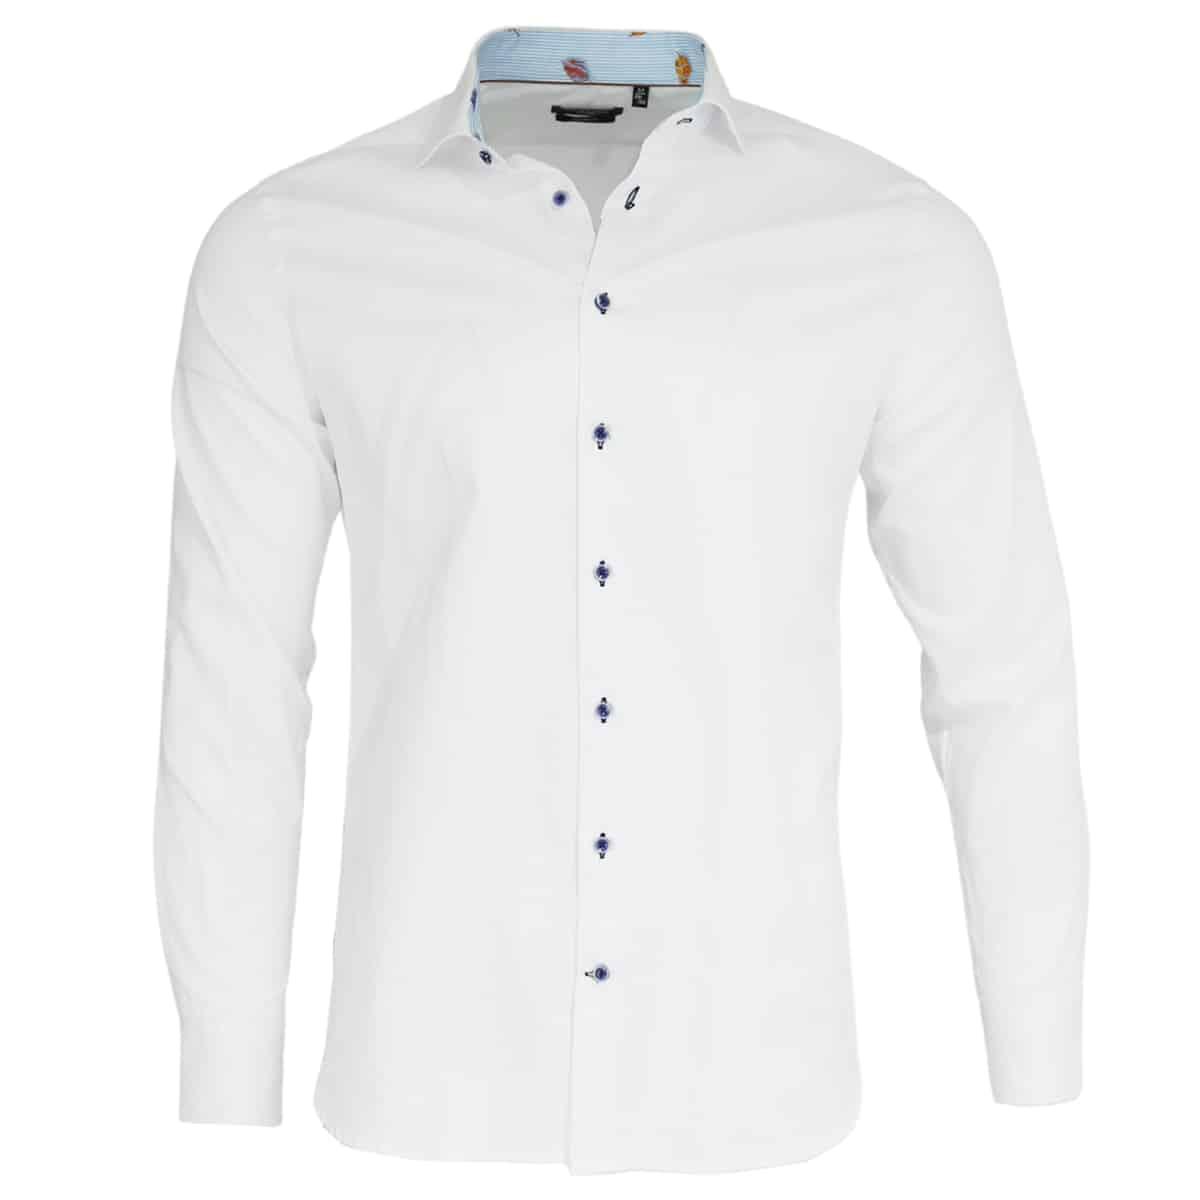 Giordano white shirt stripe pattern